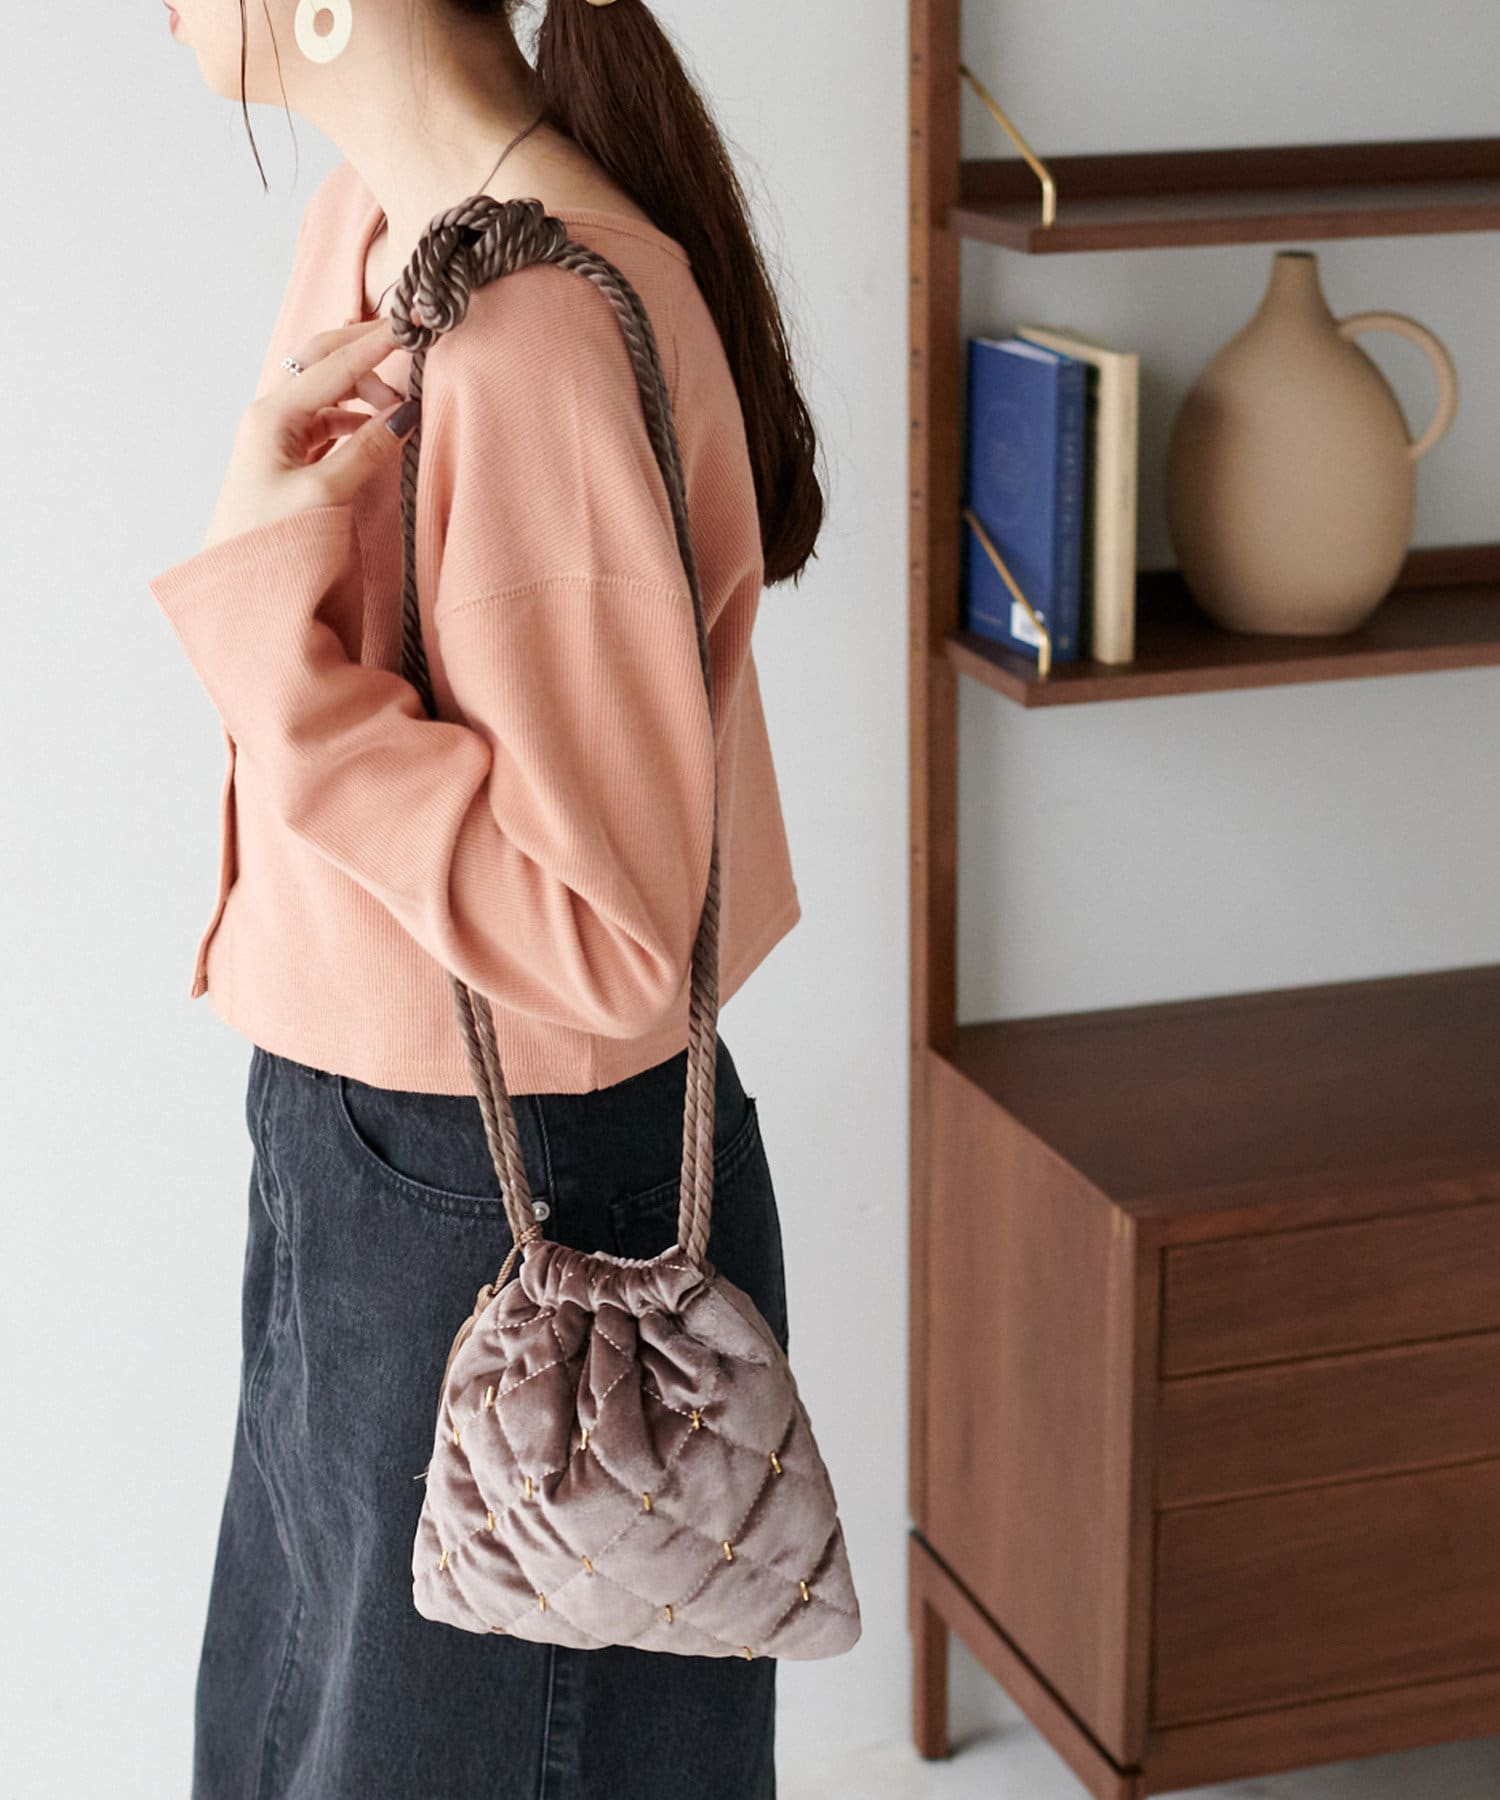 Discoat(ディスコート) ベロアキルト巾着ショルダーバッグ